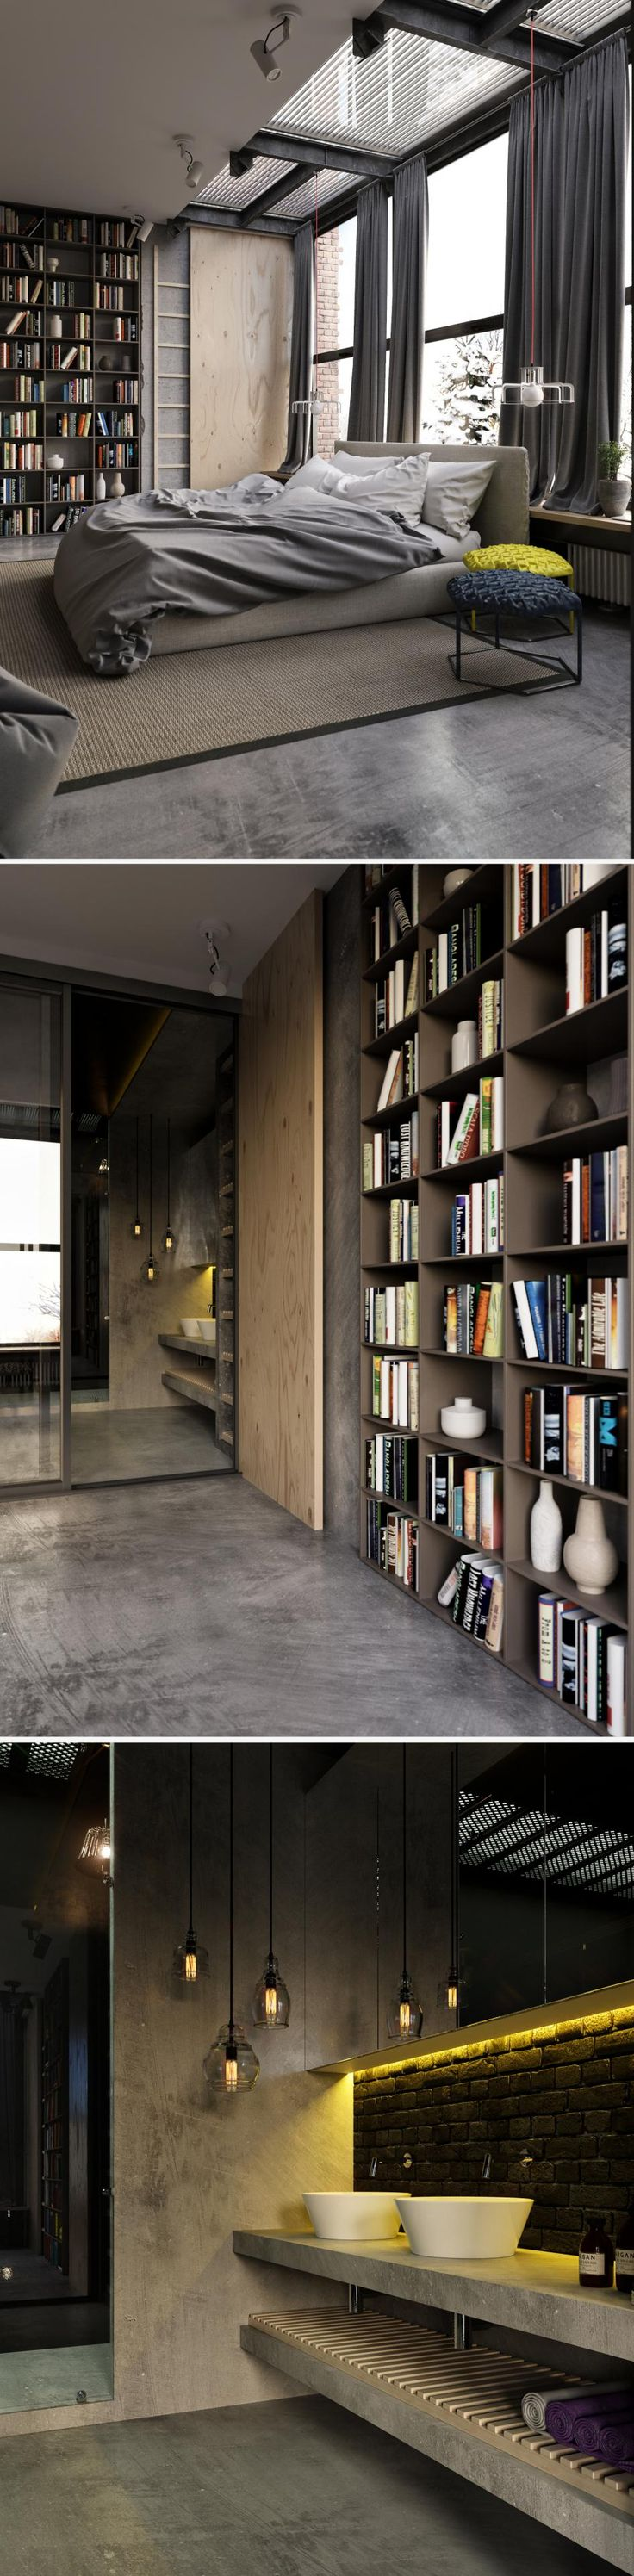 94 best interieur vloeren images on pinterest concrete floors